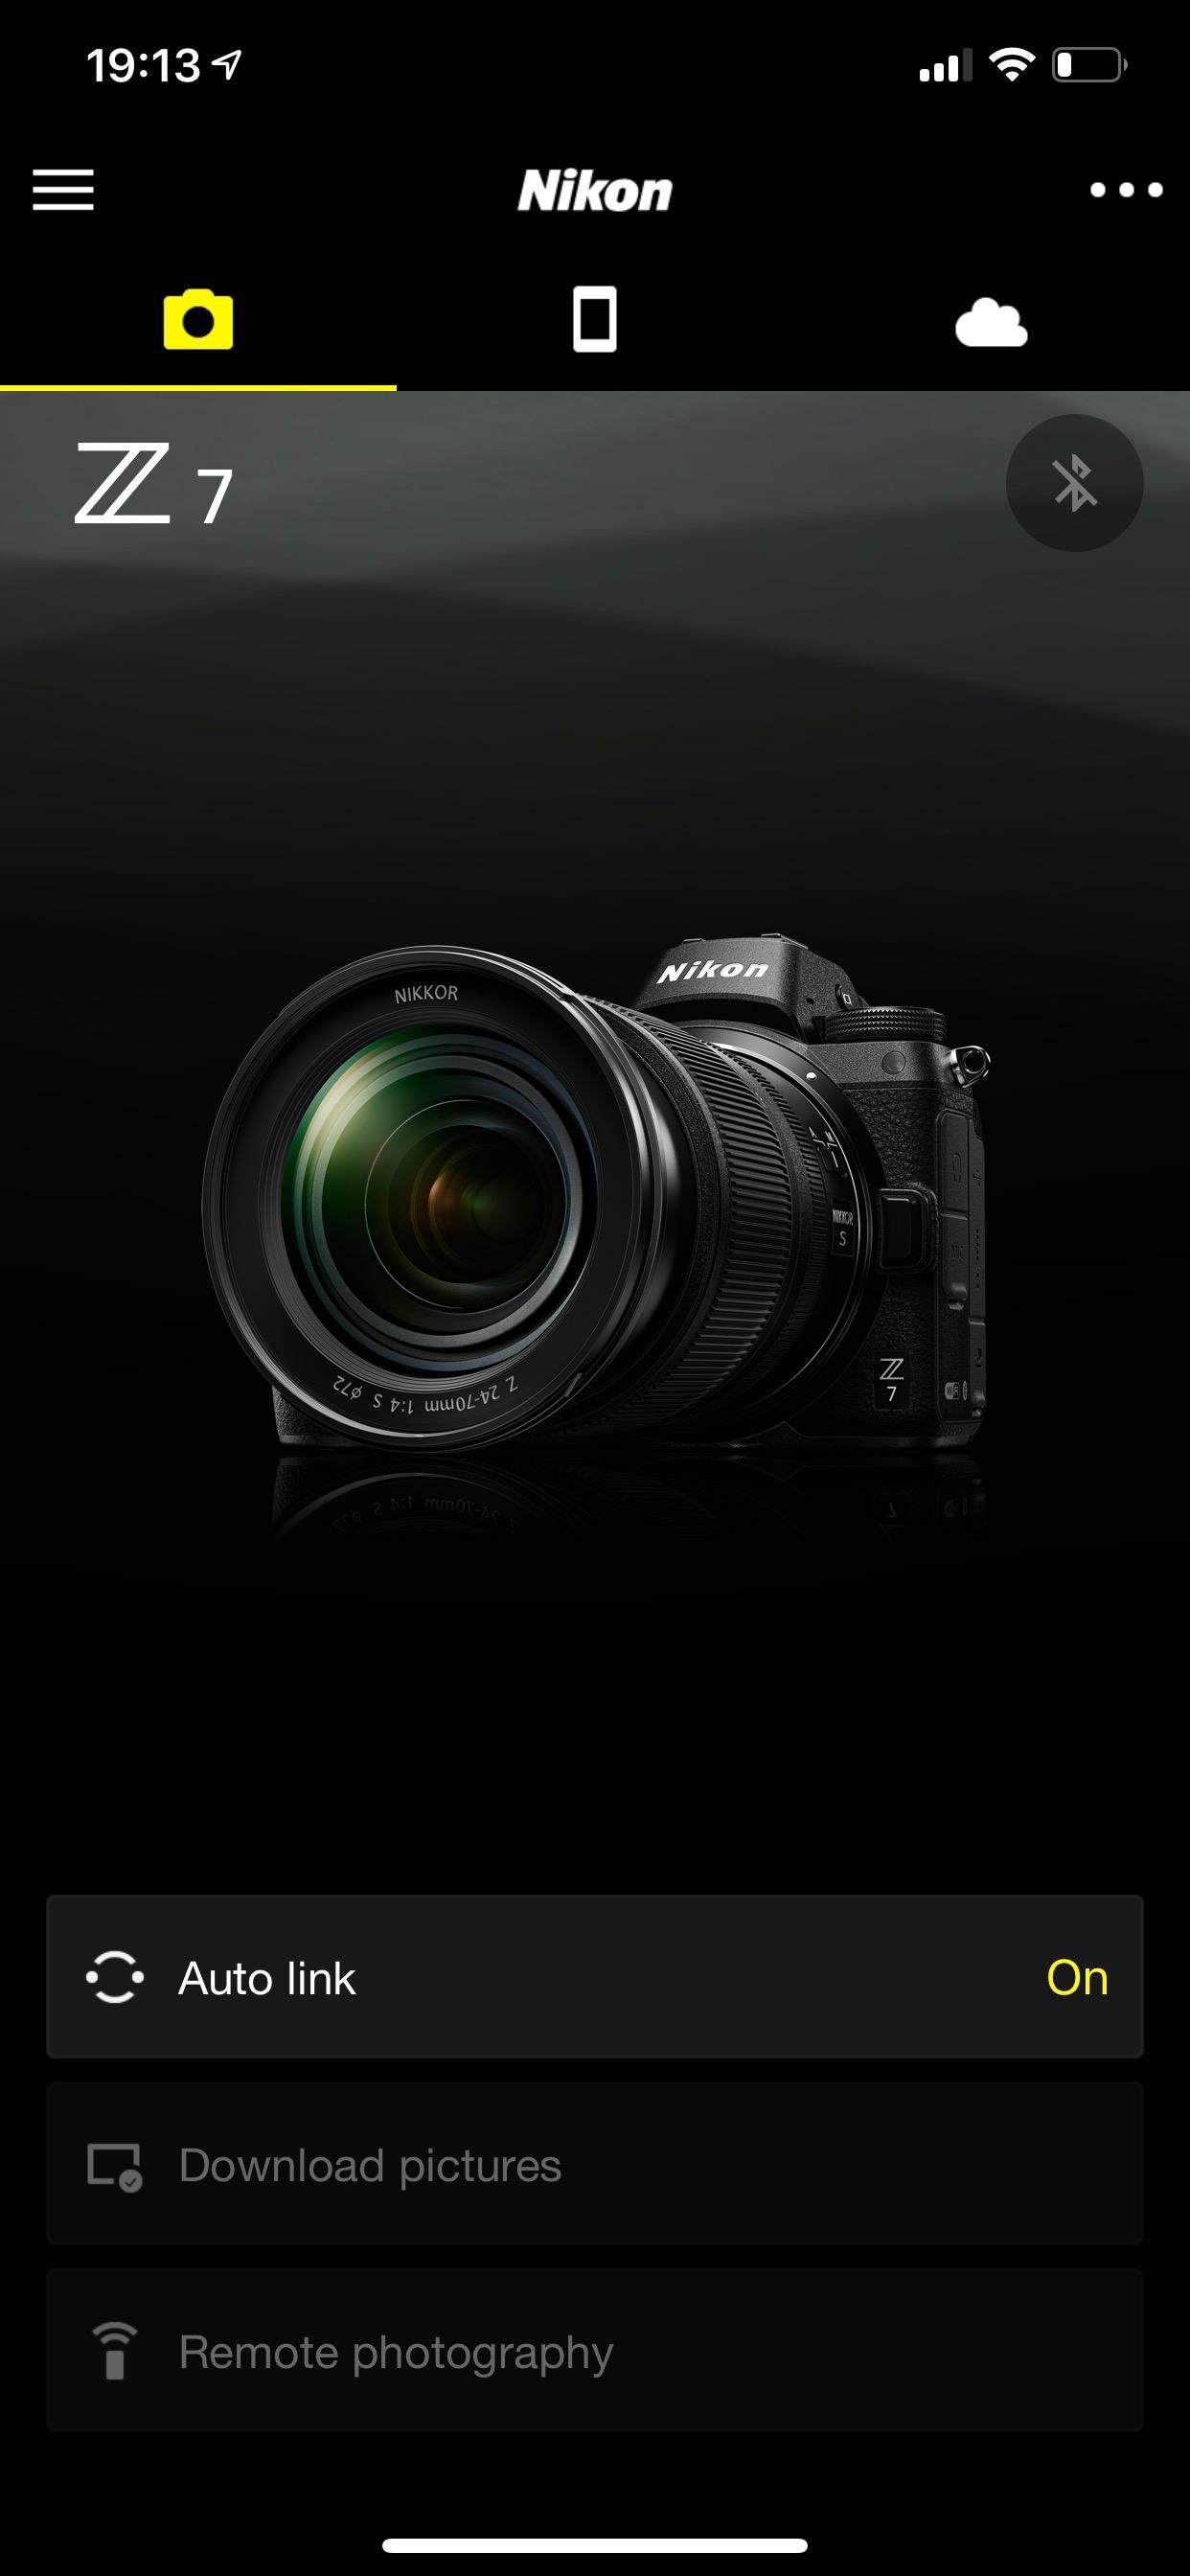 Nikon Z7 snapseed